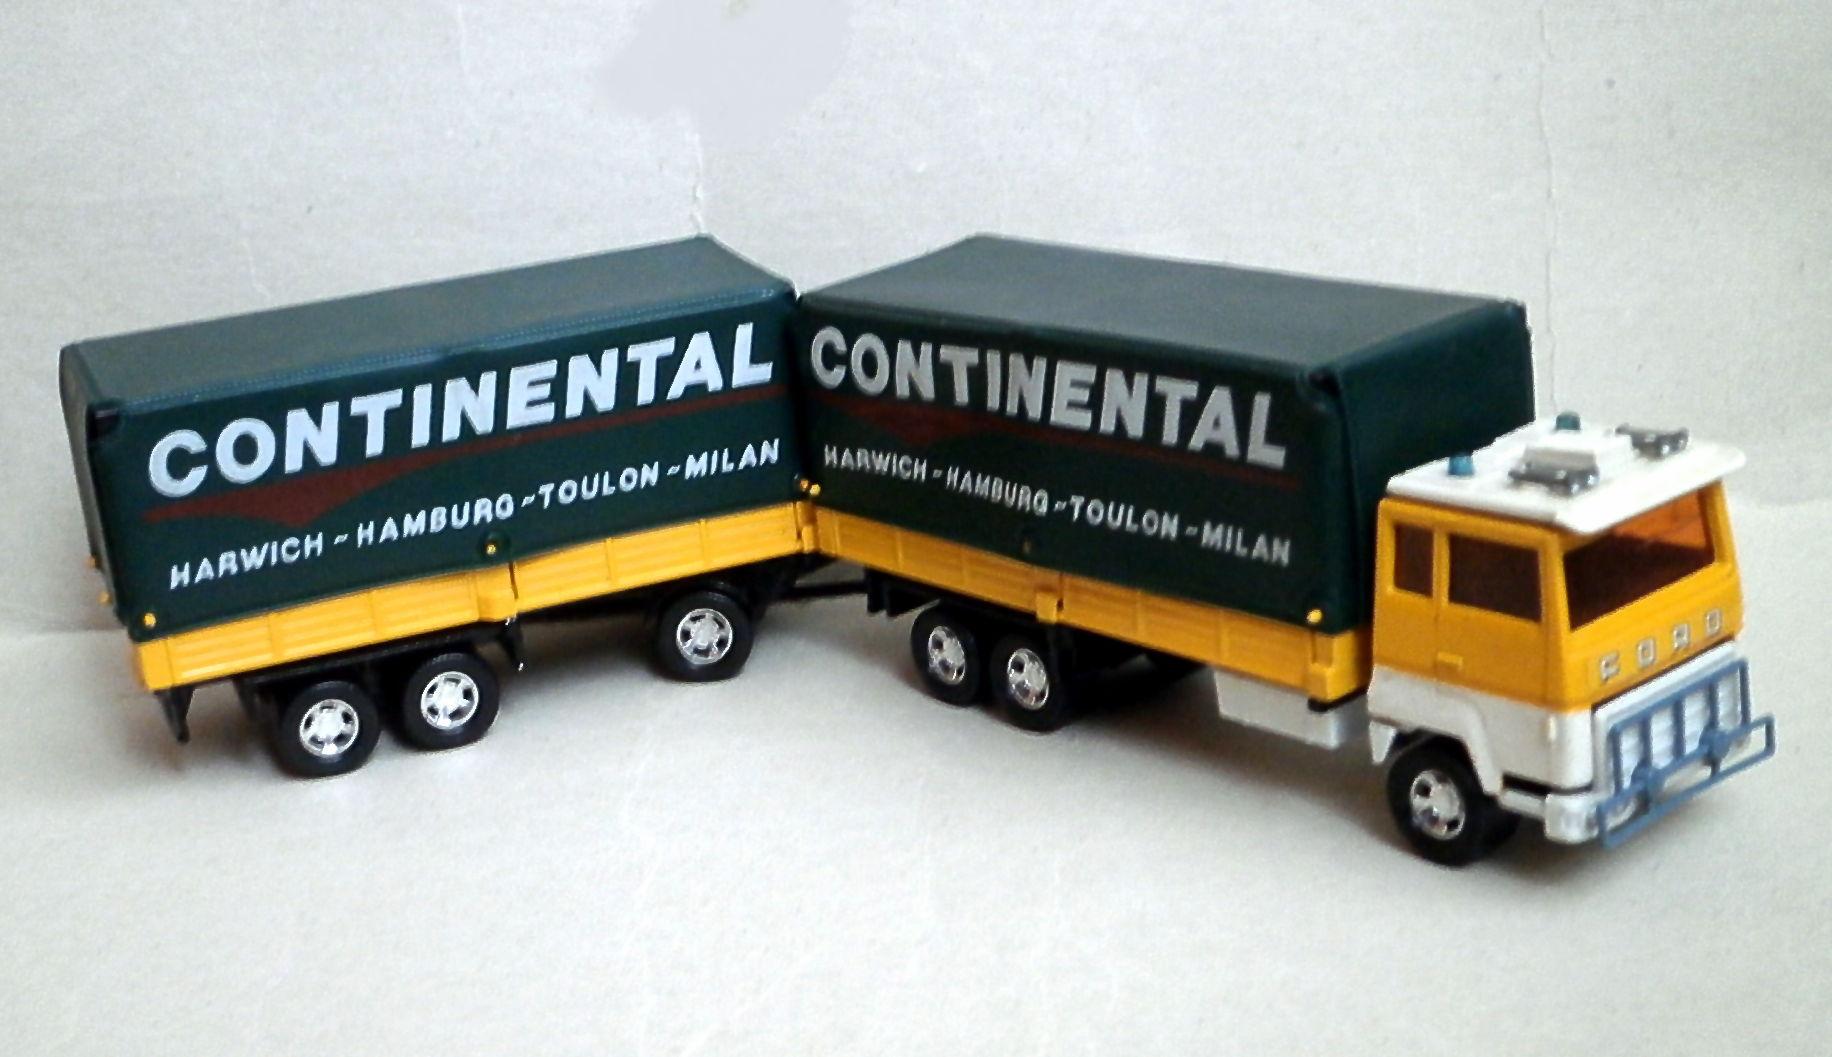 Ford Transcontinental (1979-81 CONTINENTAL).jpg